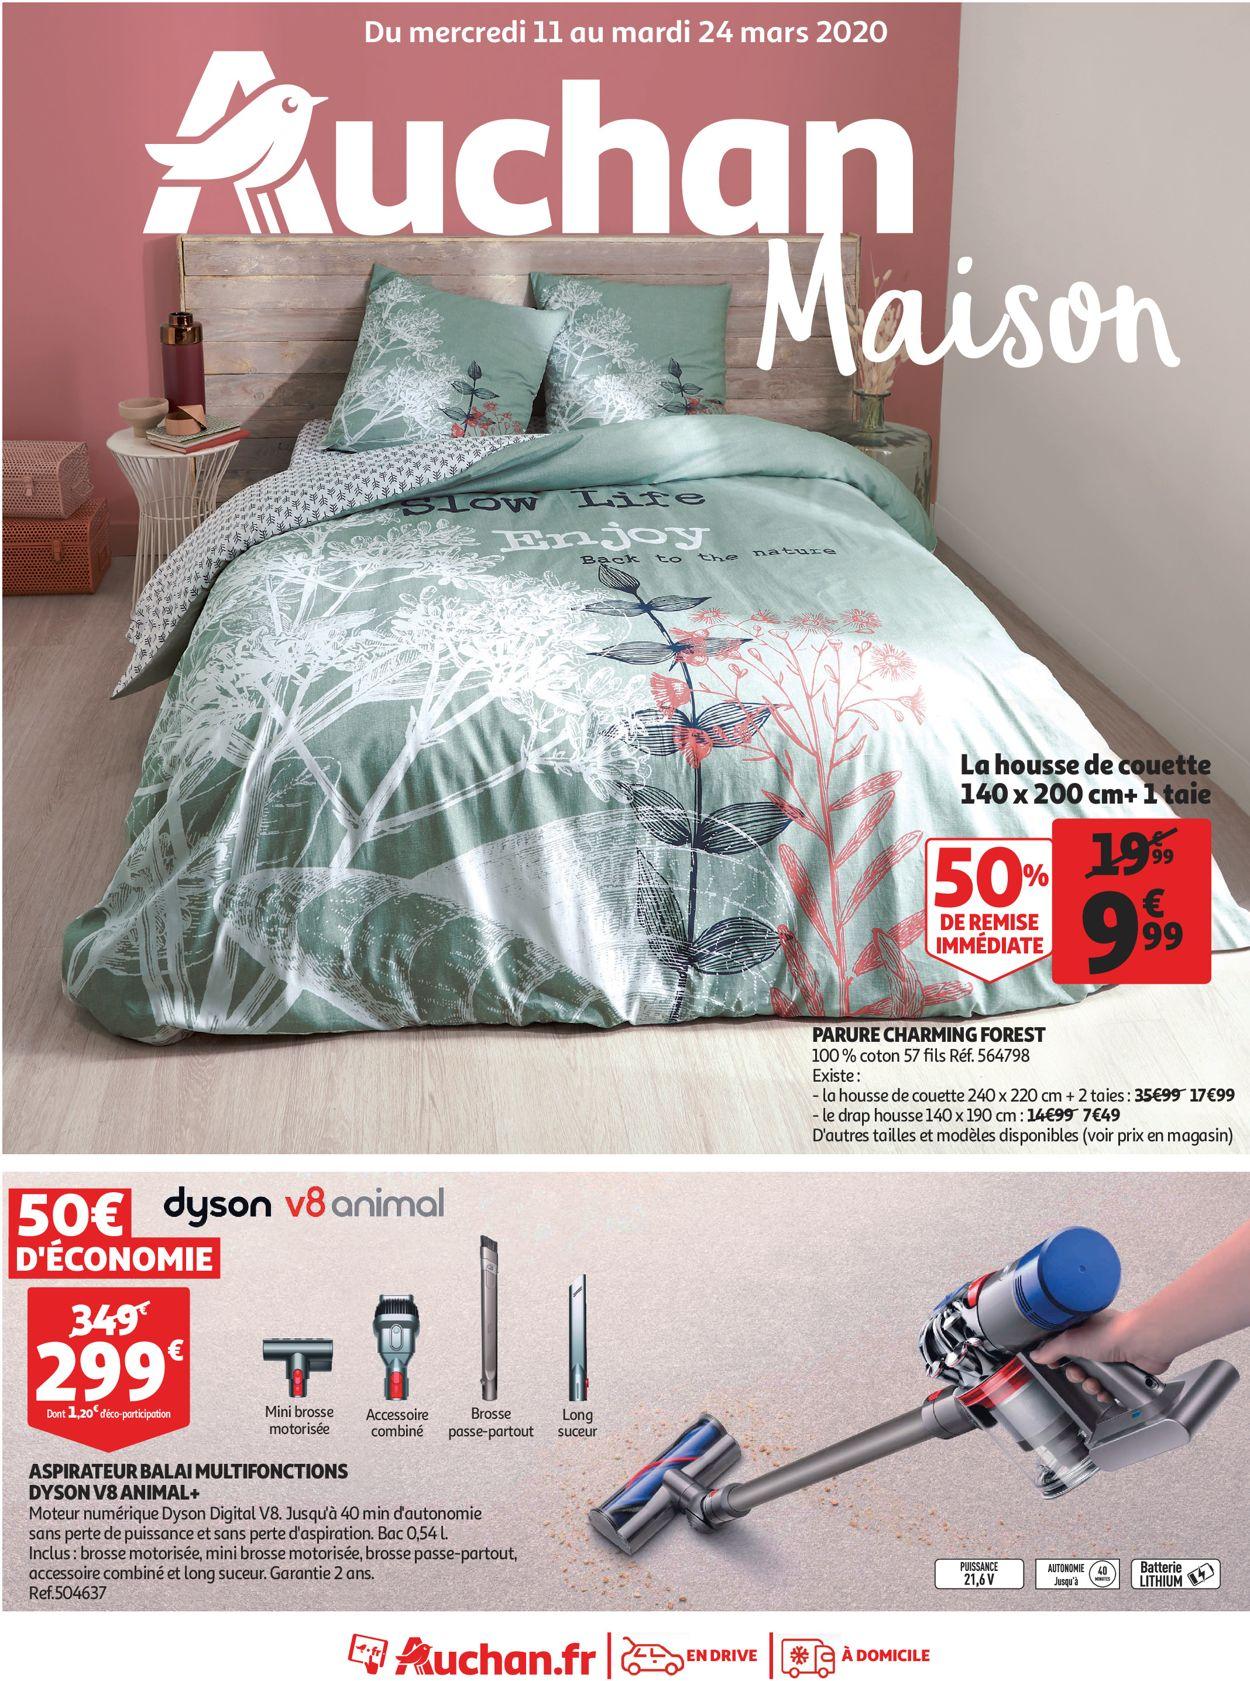 Auchan Catalogue - 11.03-24.03.2020